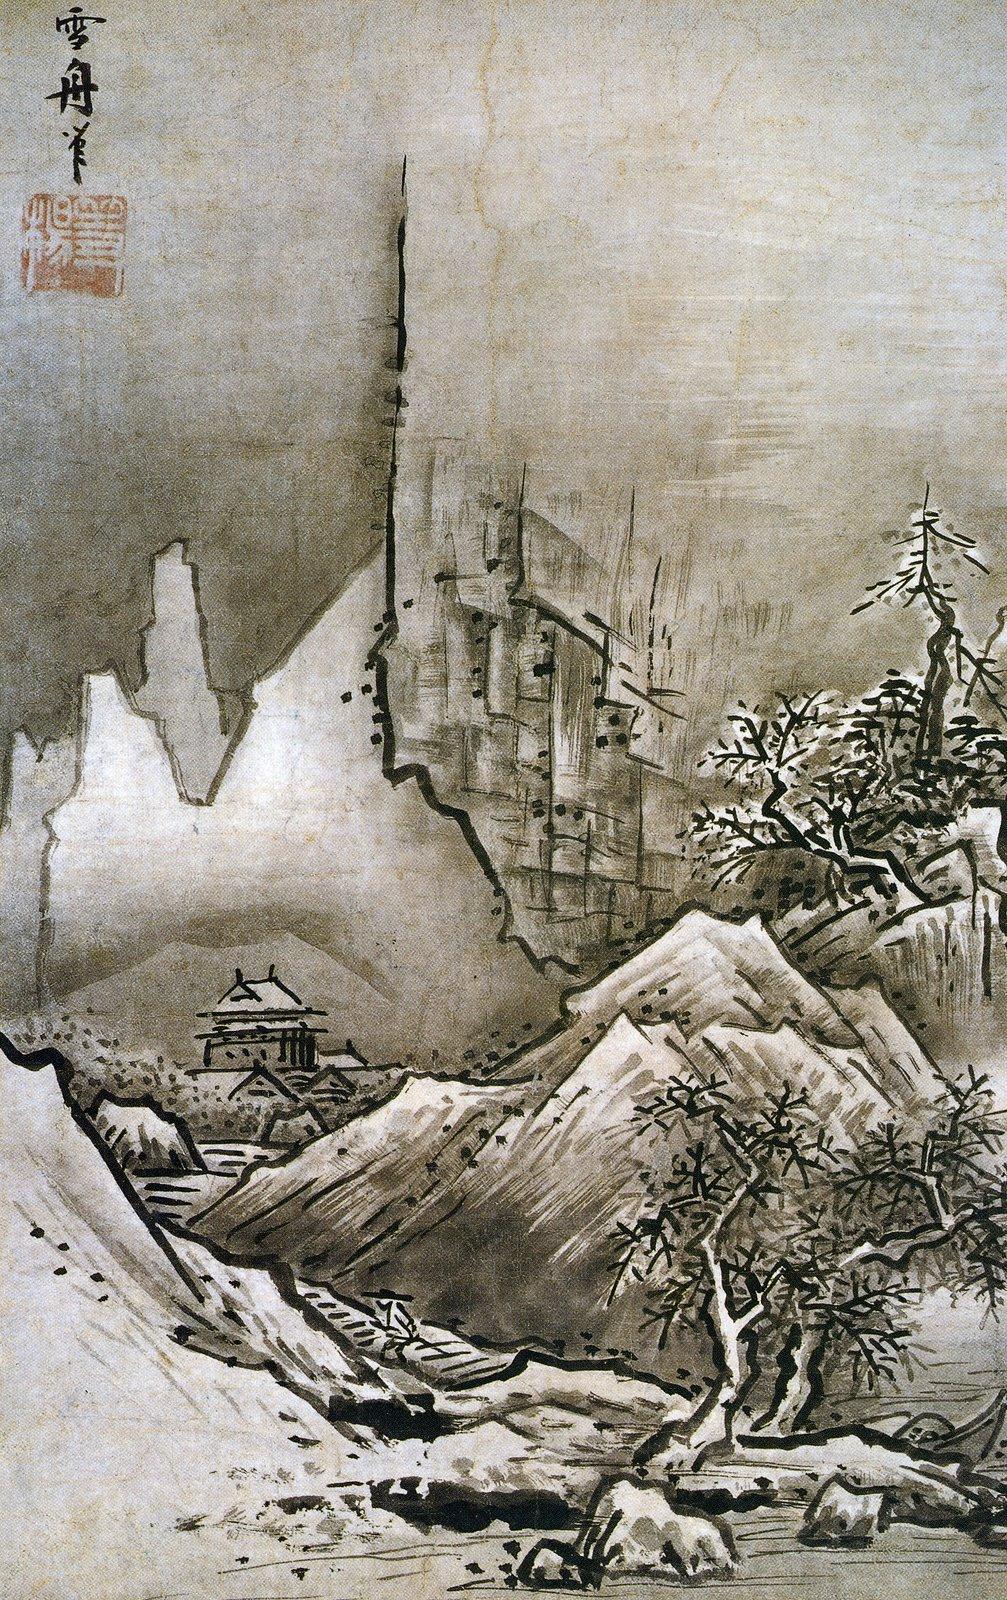 Winter Landscape by Sesshu Toyo